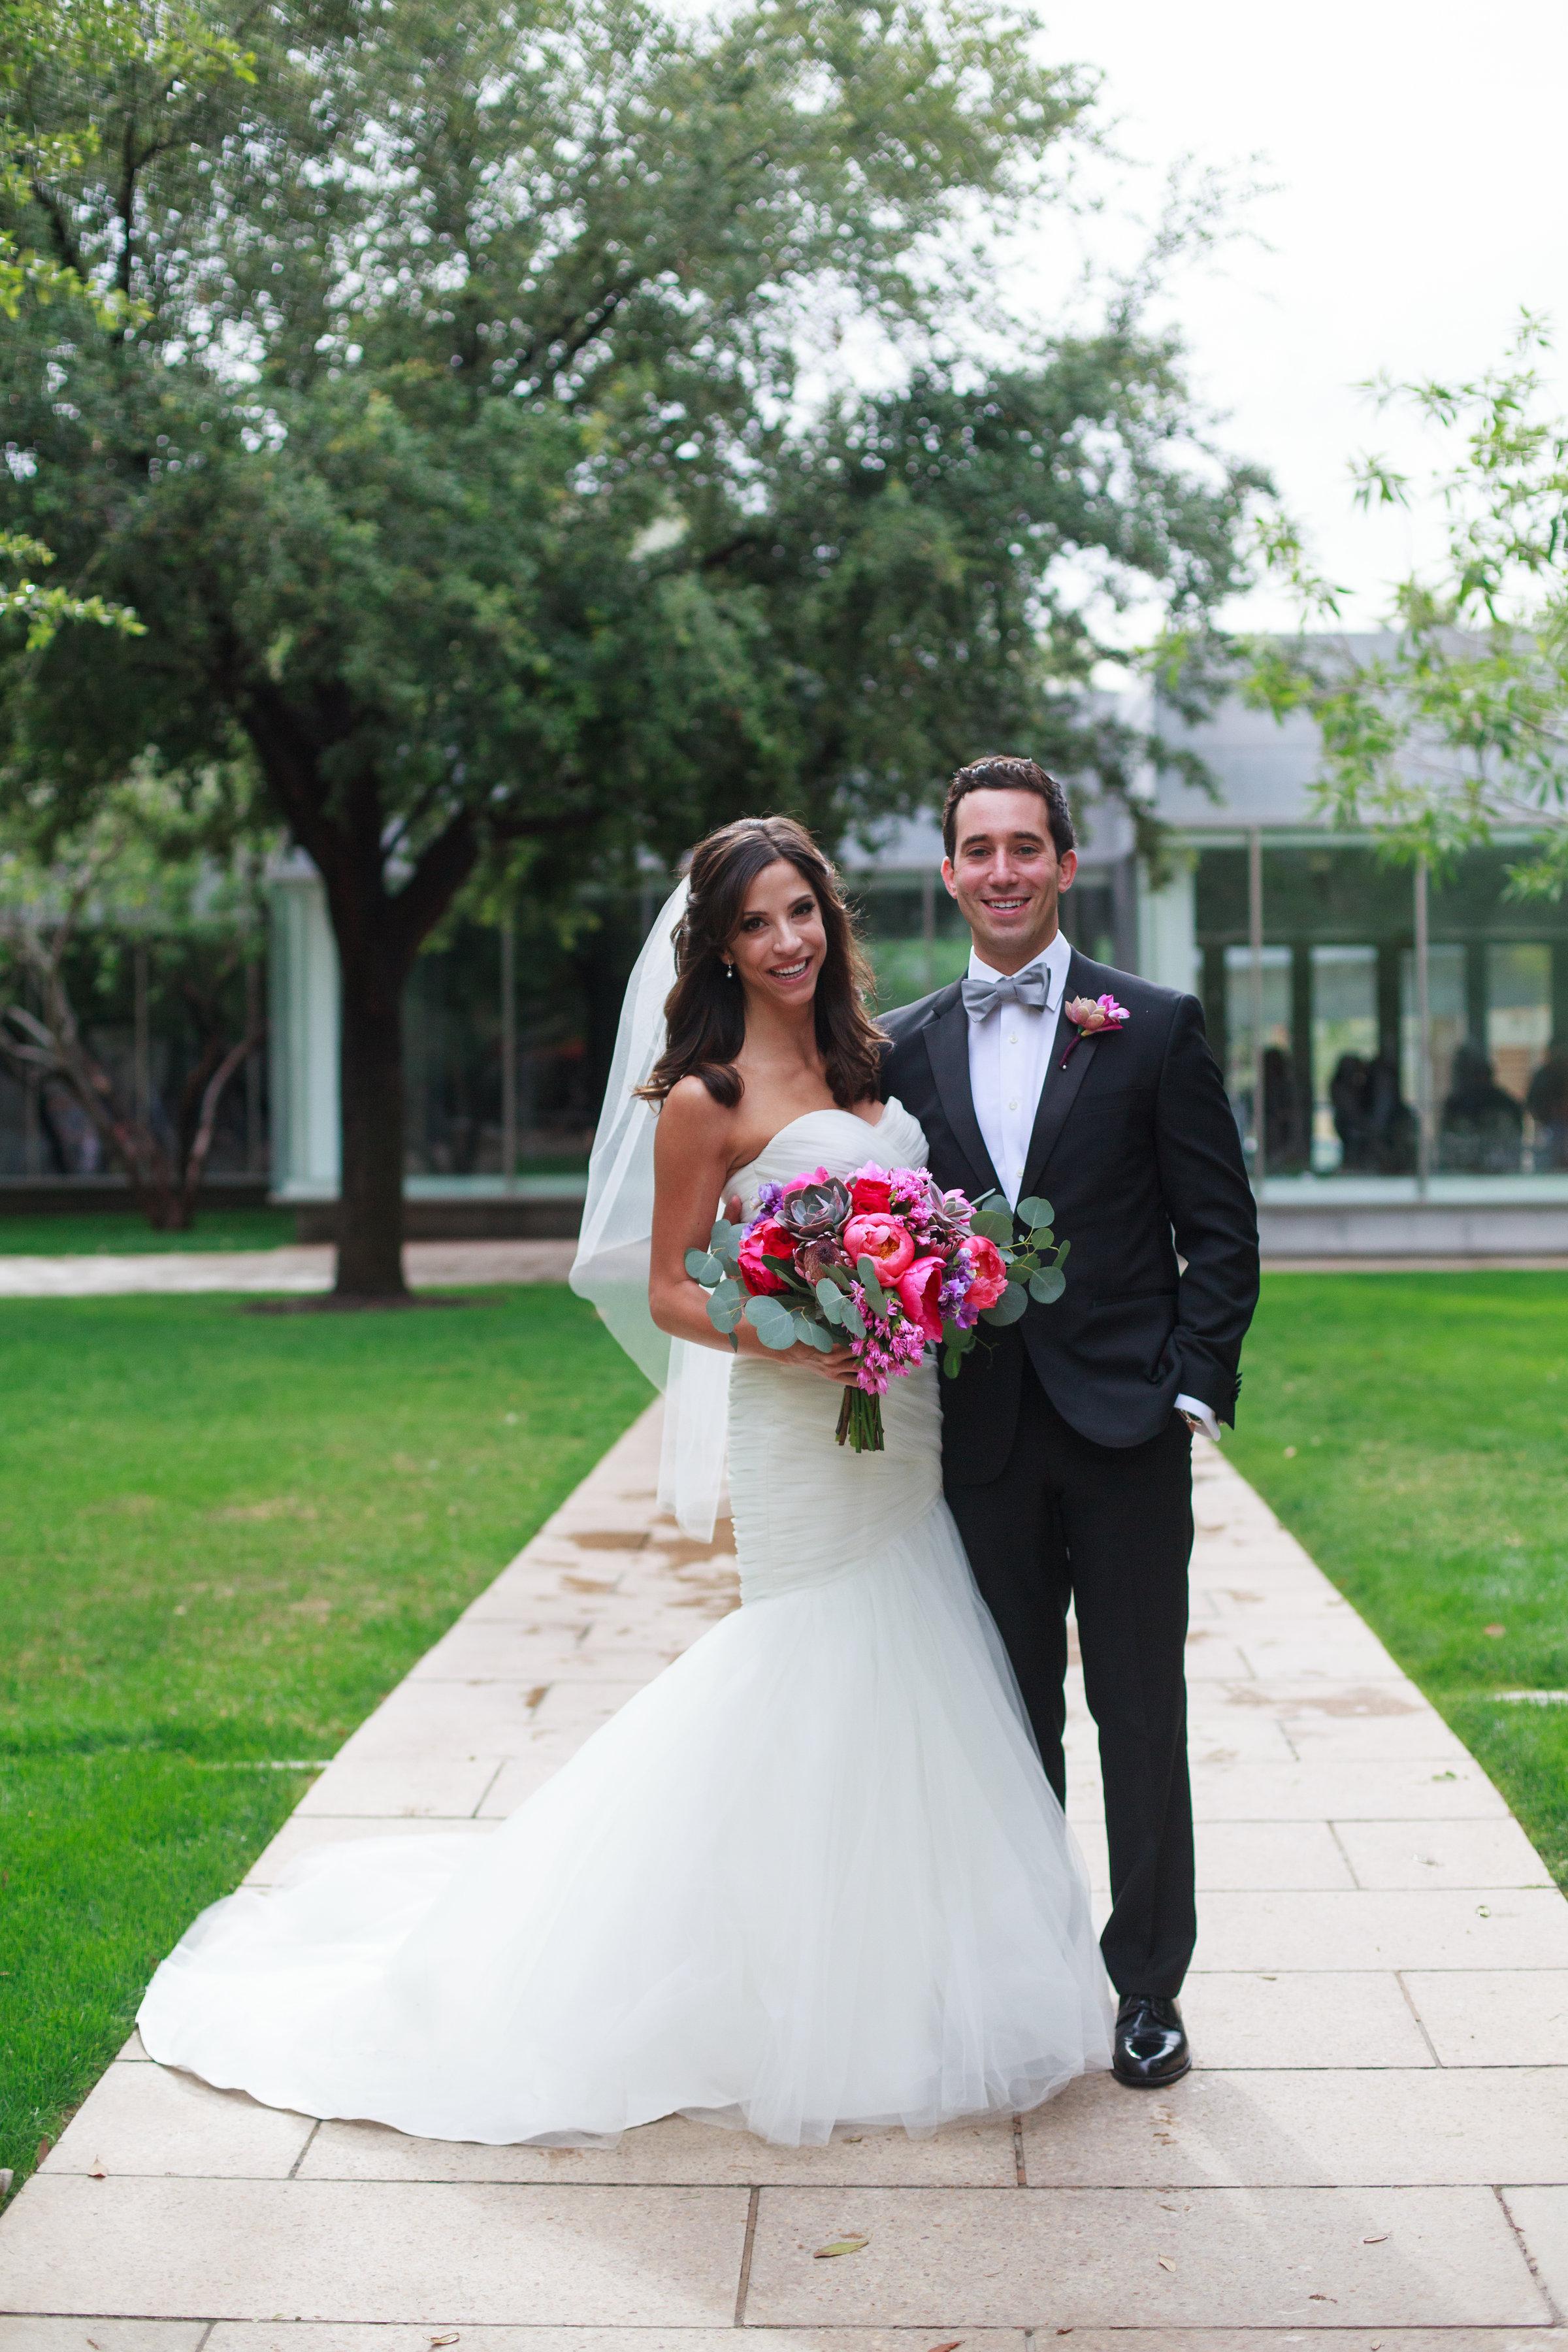 wedding, Arizona wedding, art museum wedding, wedding planner, wedding lighting, Phoenix-Scottsdale-Arizona-Wedding-Planner-Wedding-Venue-Destination-Wedding-Planner, bride, groom